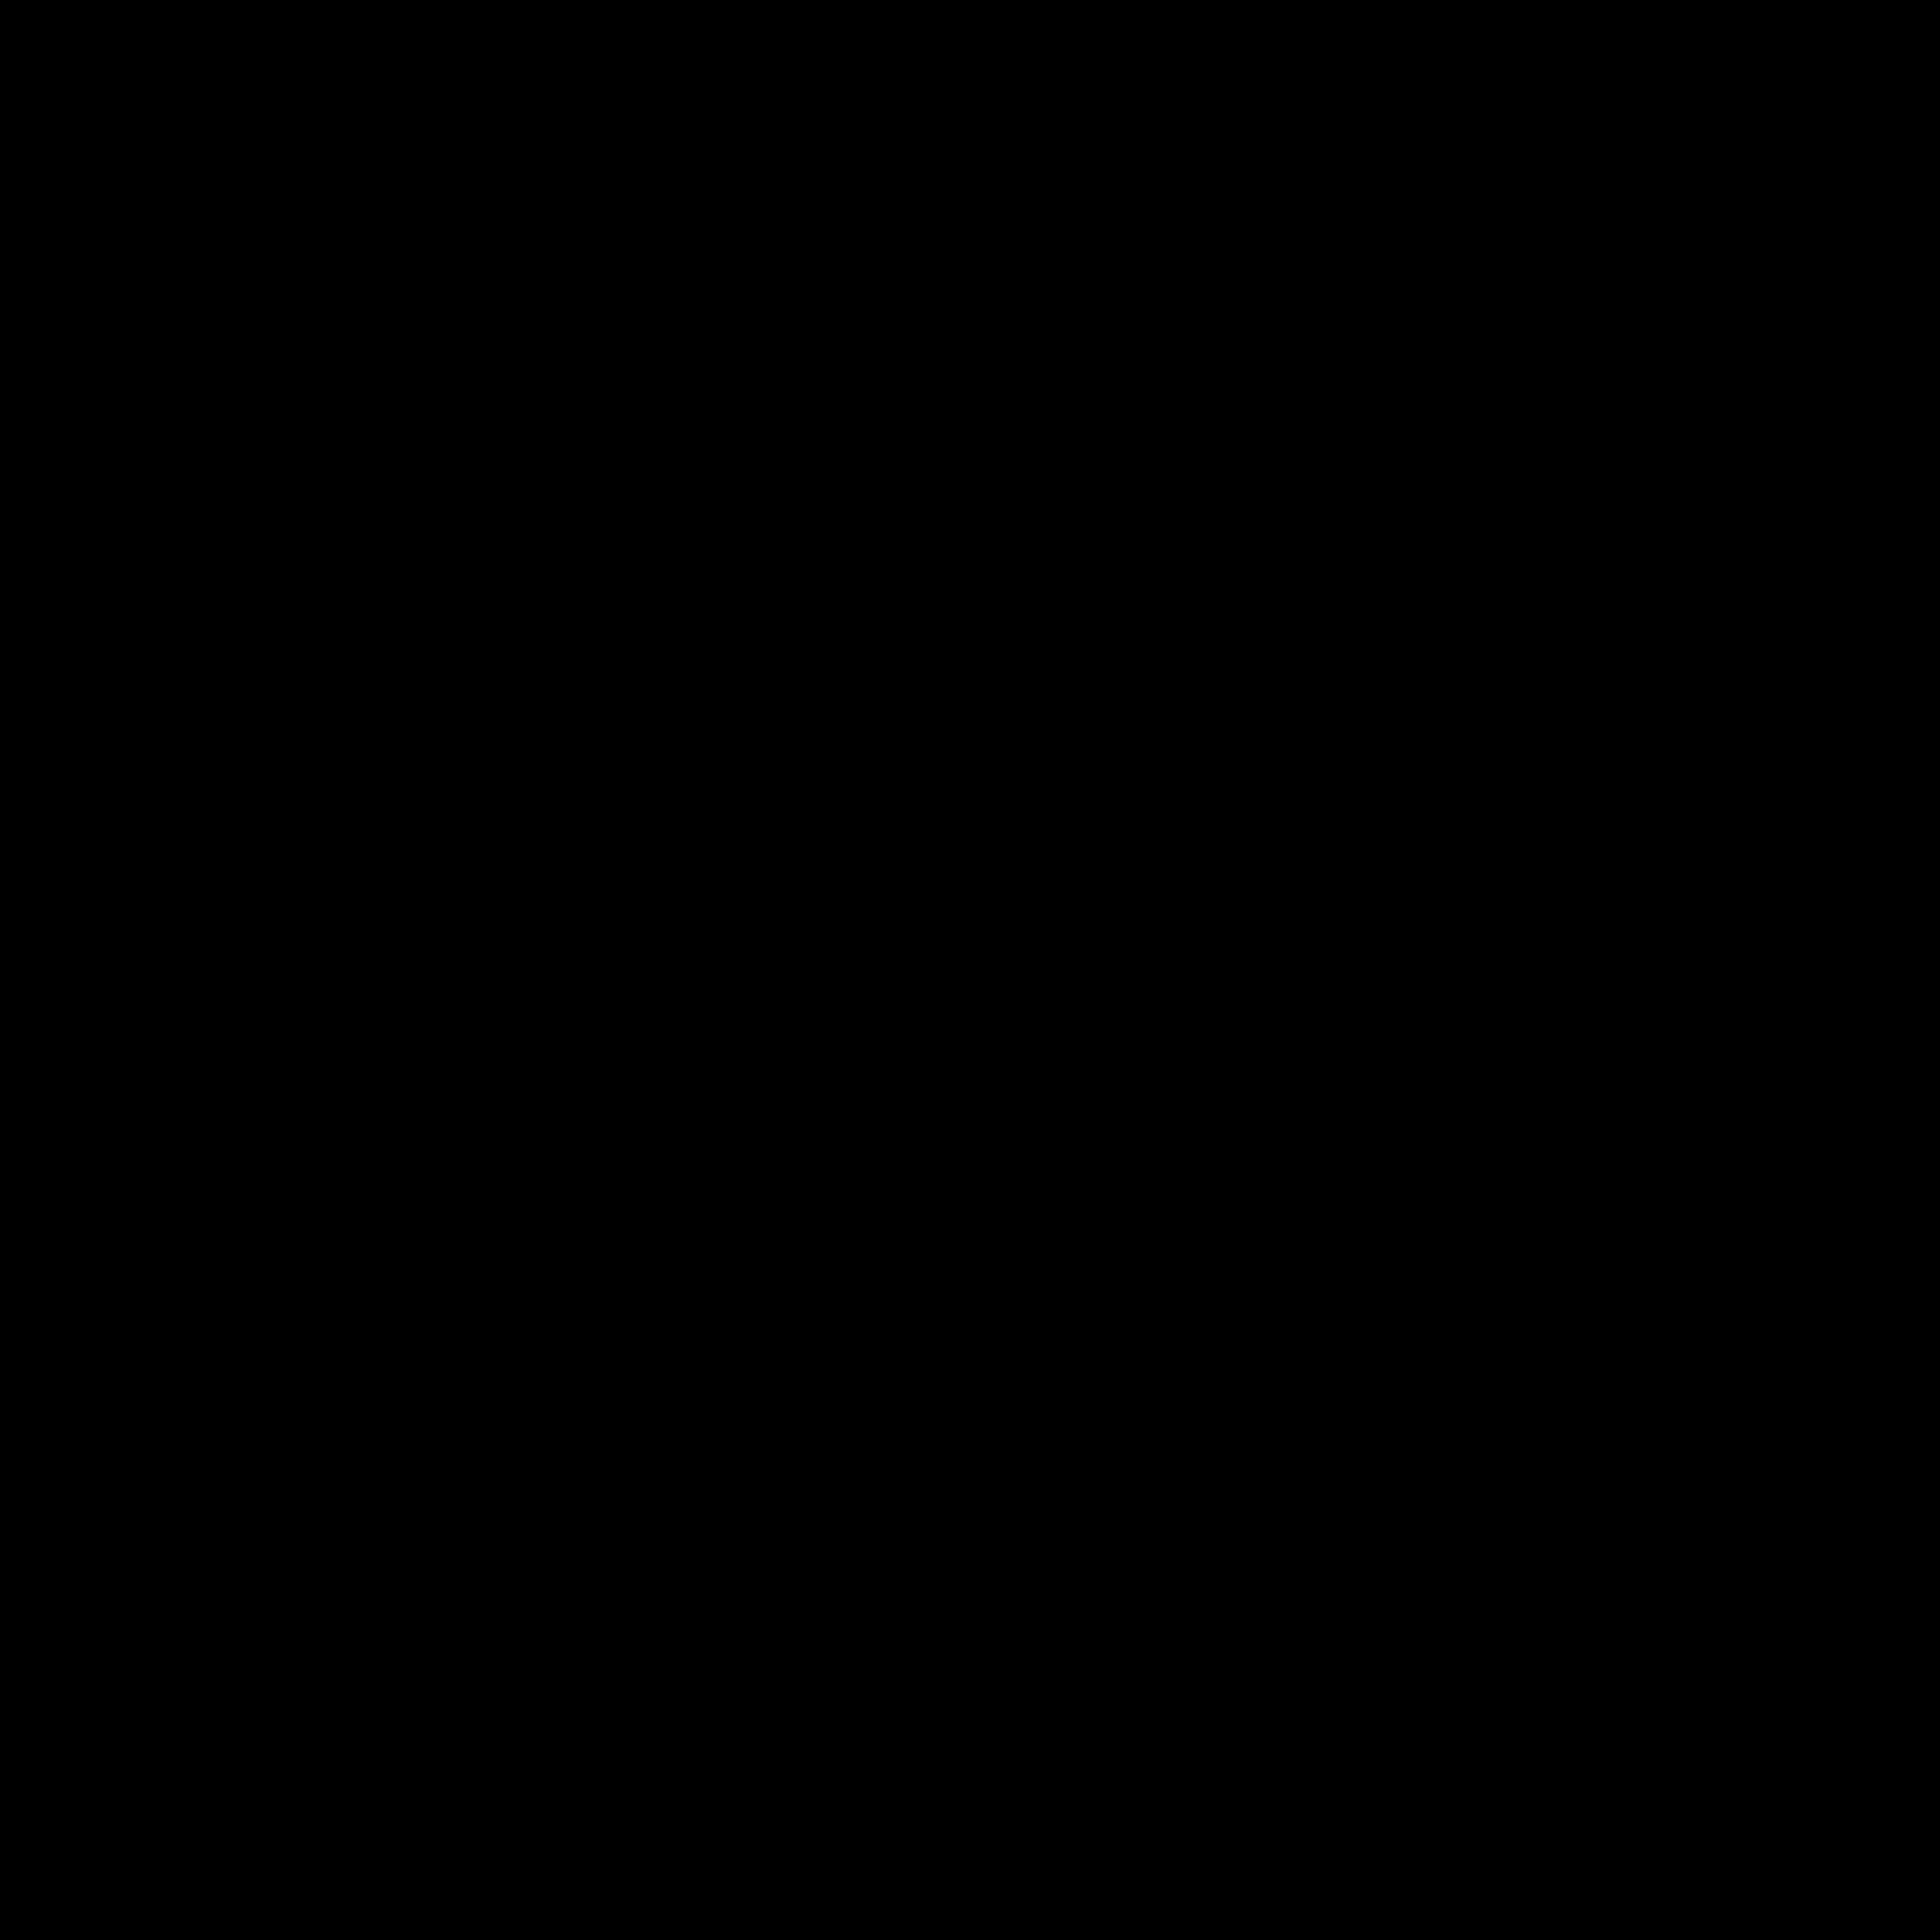 Raymond Weil Logo PNG Transparent & SVG Vector - Freebie Supply